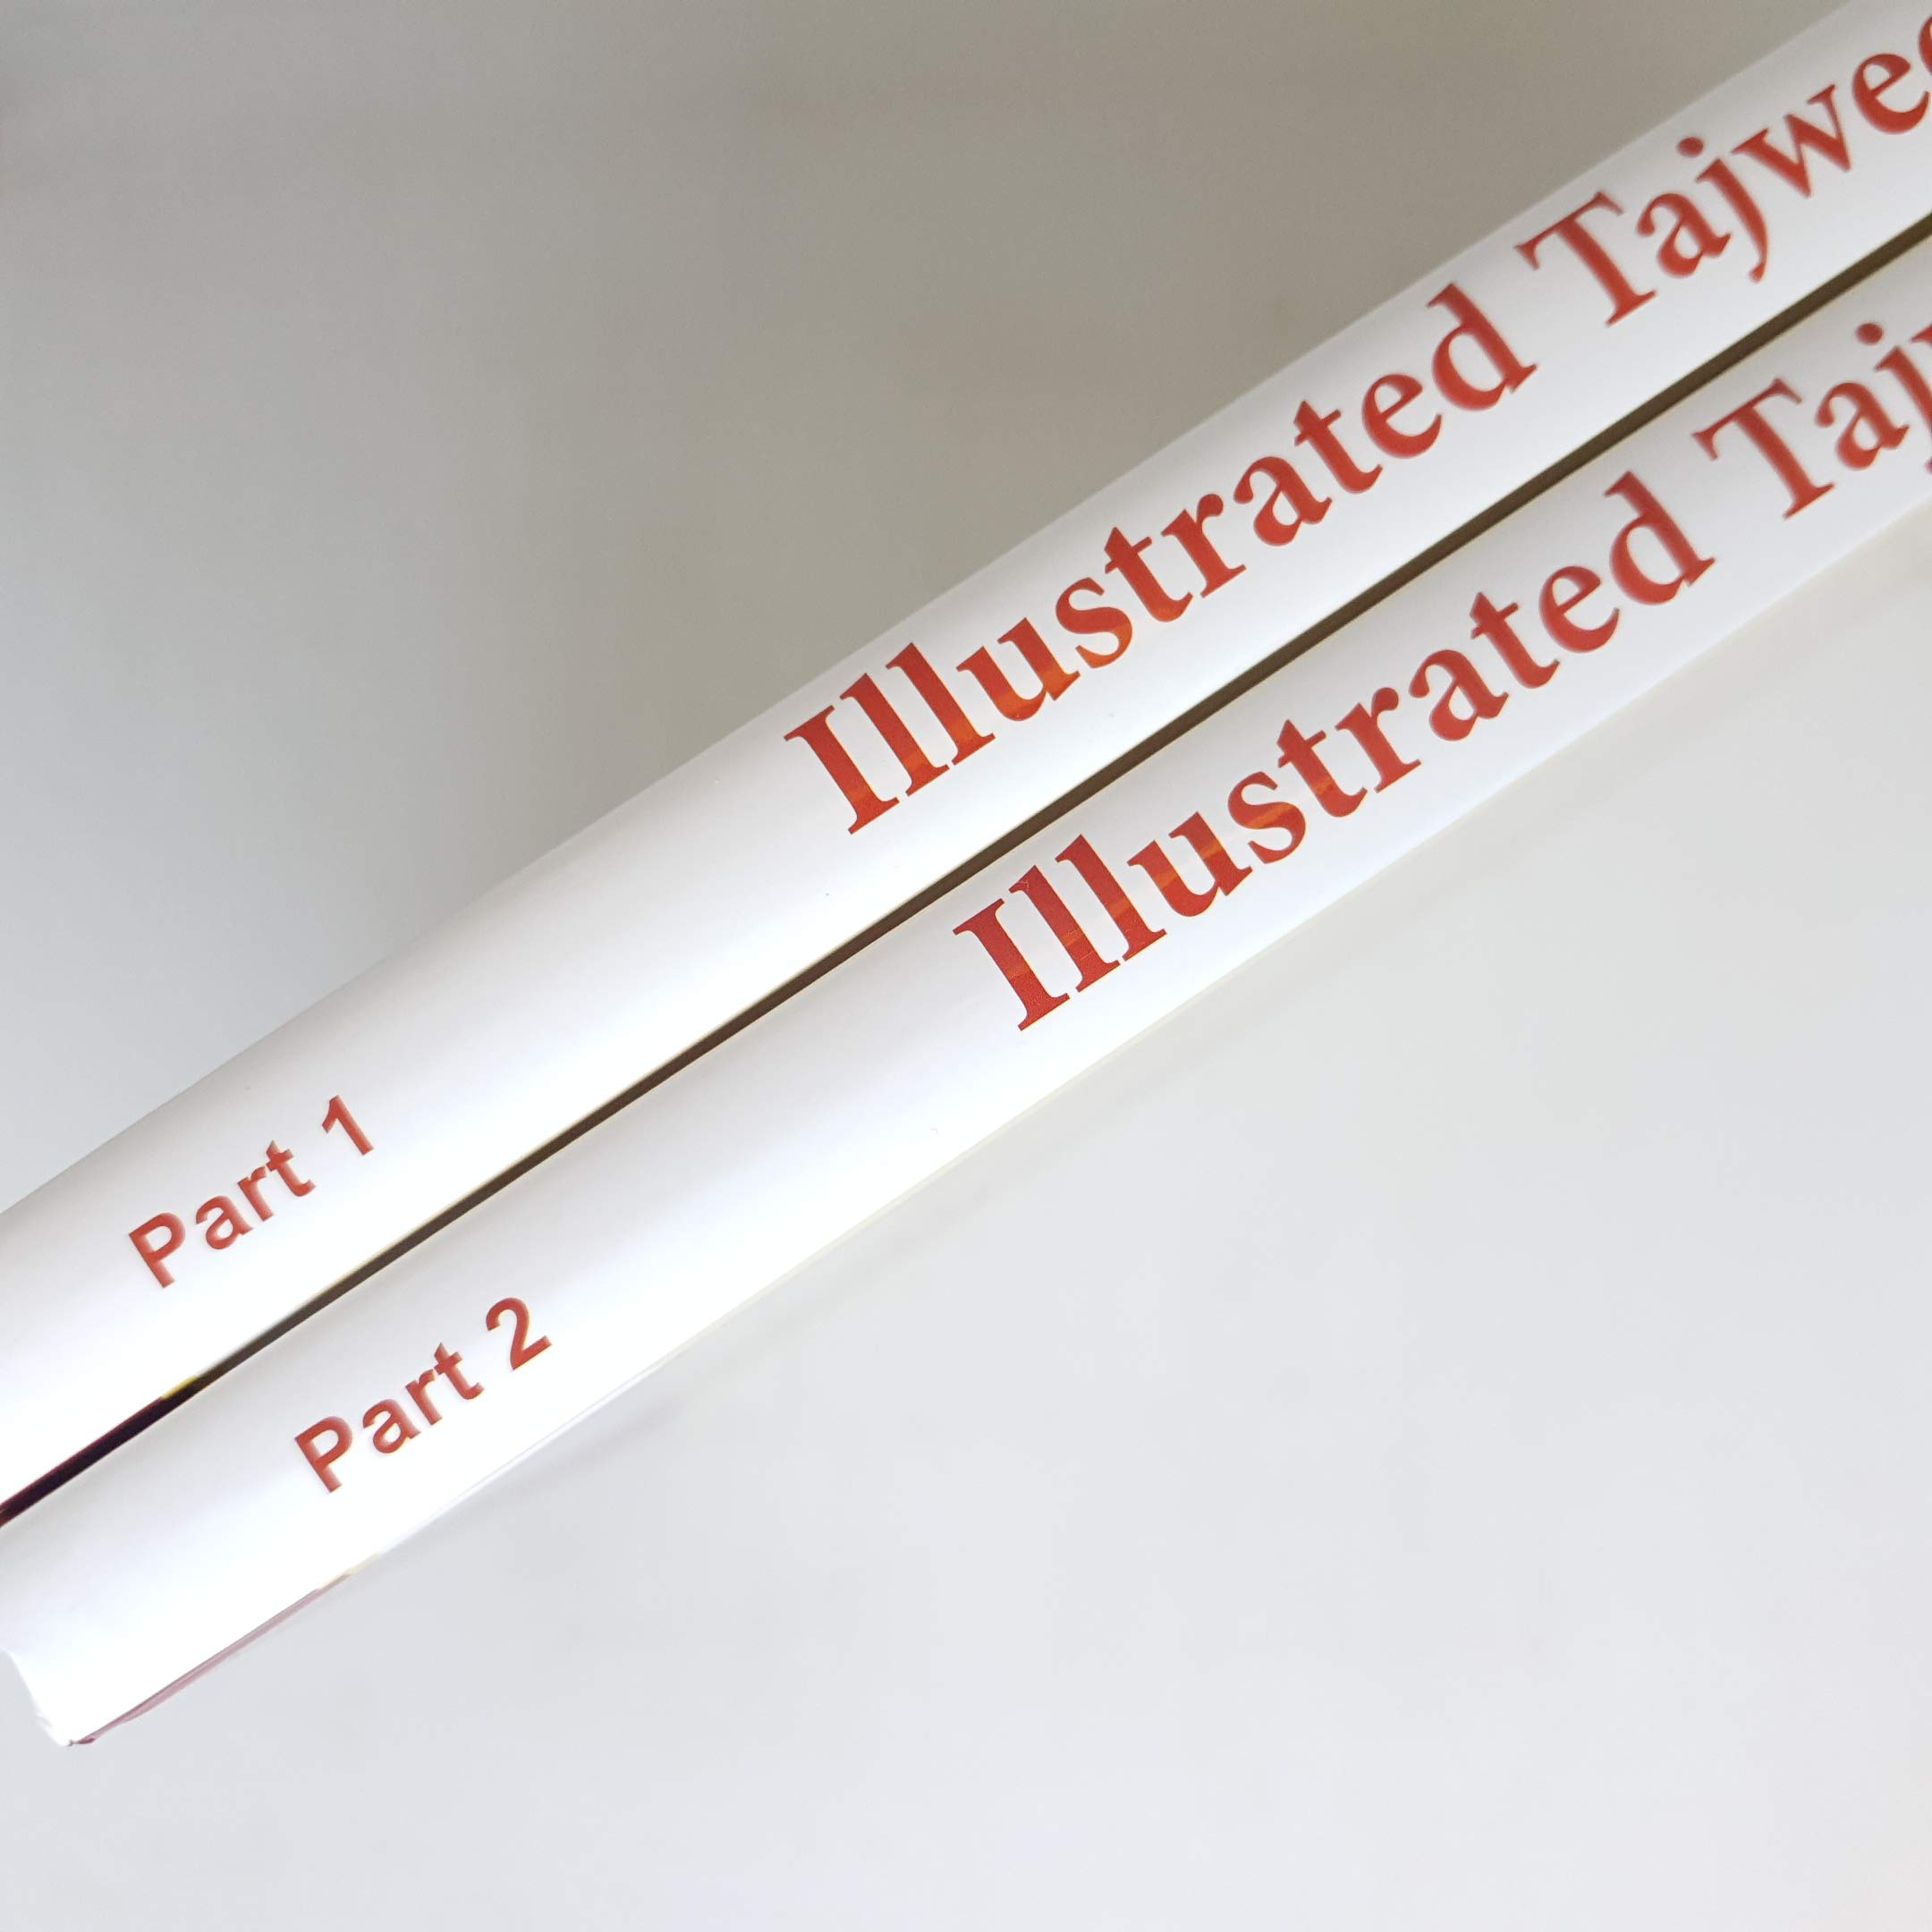 Illustrated Tajweed Two Volumes التجويد المصور باللغة الإنجليزية Dr Ayman Rushdi Swaid 9789933605216 Amazon Com Books